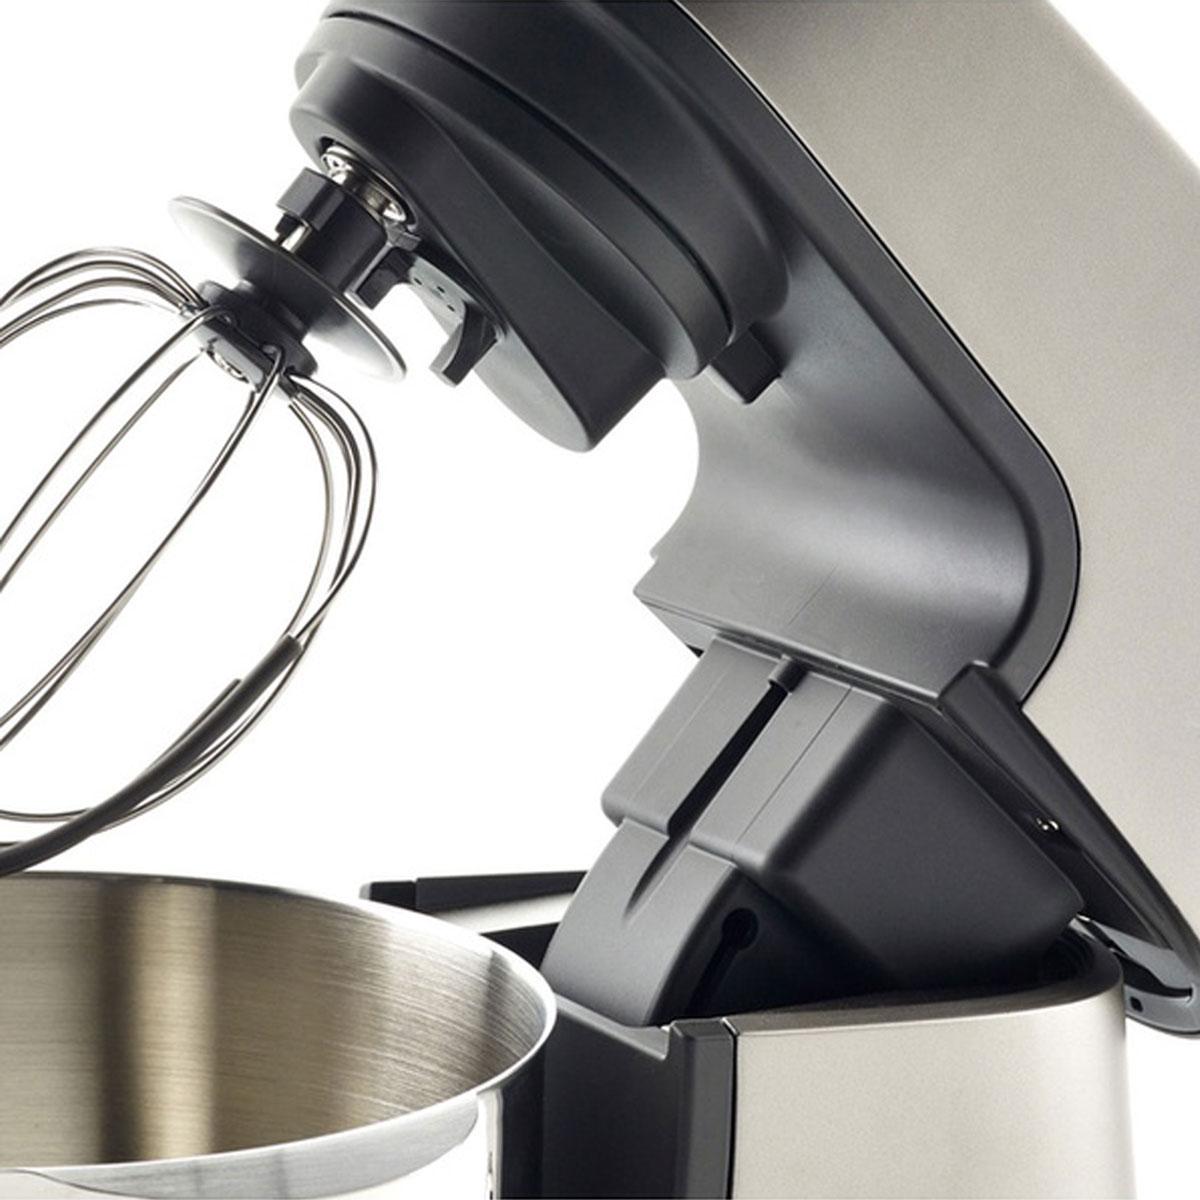 moulinex robot p tissier masterchef gourmet qa600hb1 moulinex sur maginea. Black Bedroom Furniture Sets. Home Design Ideas